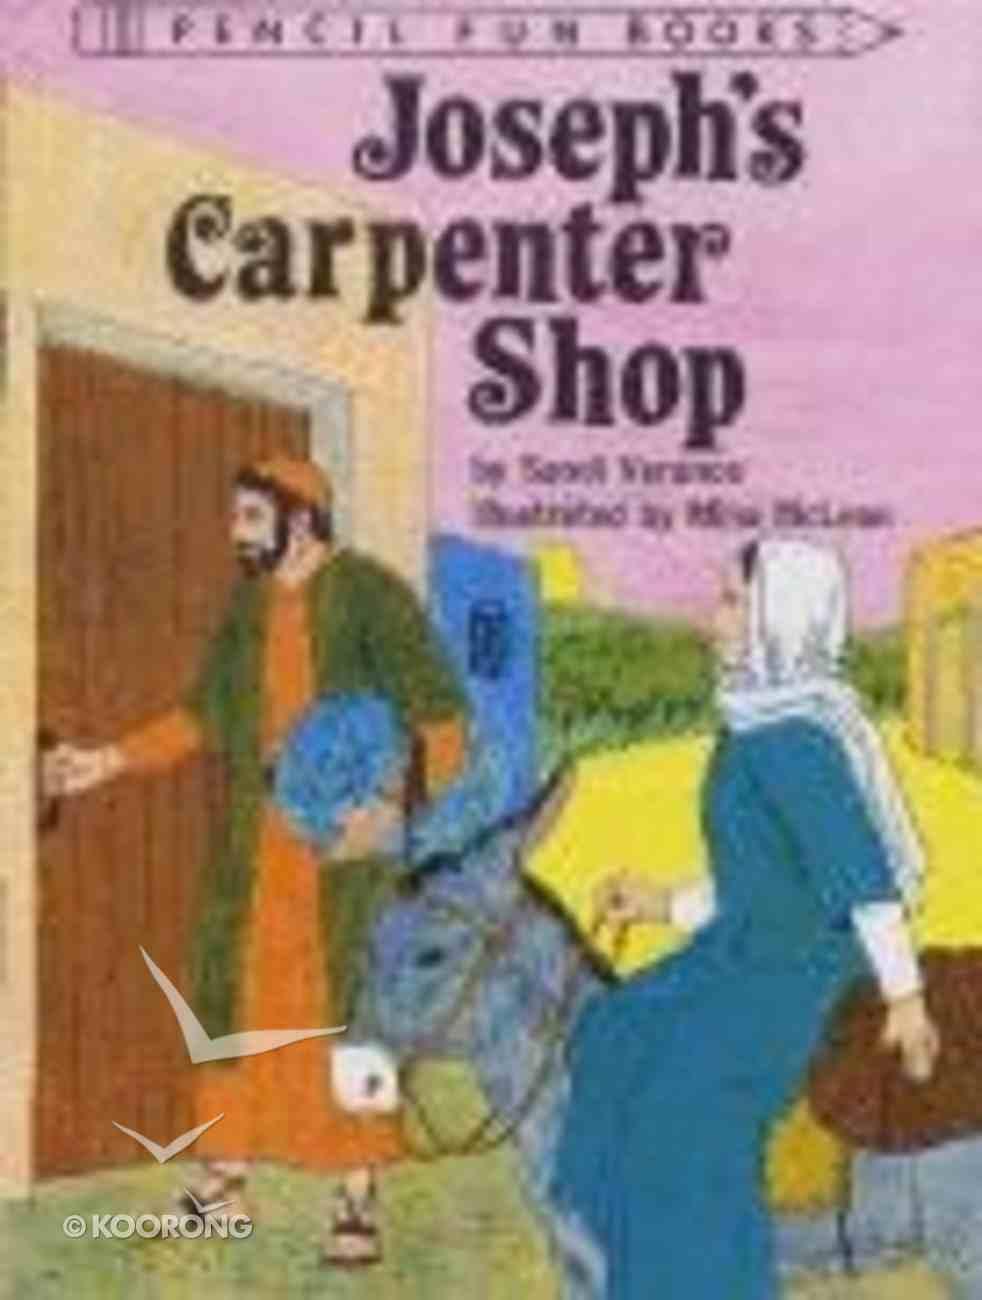 Joseph's Carpenter Shop (Pencil Fun Books Series) Paperback